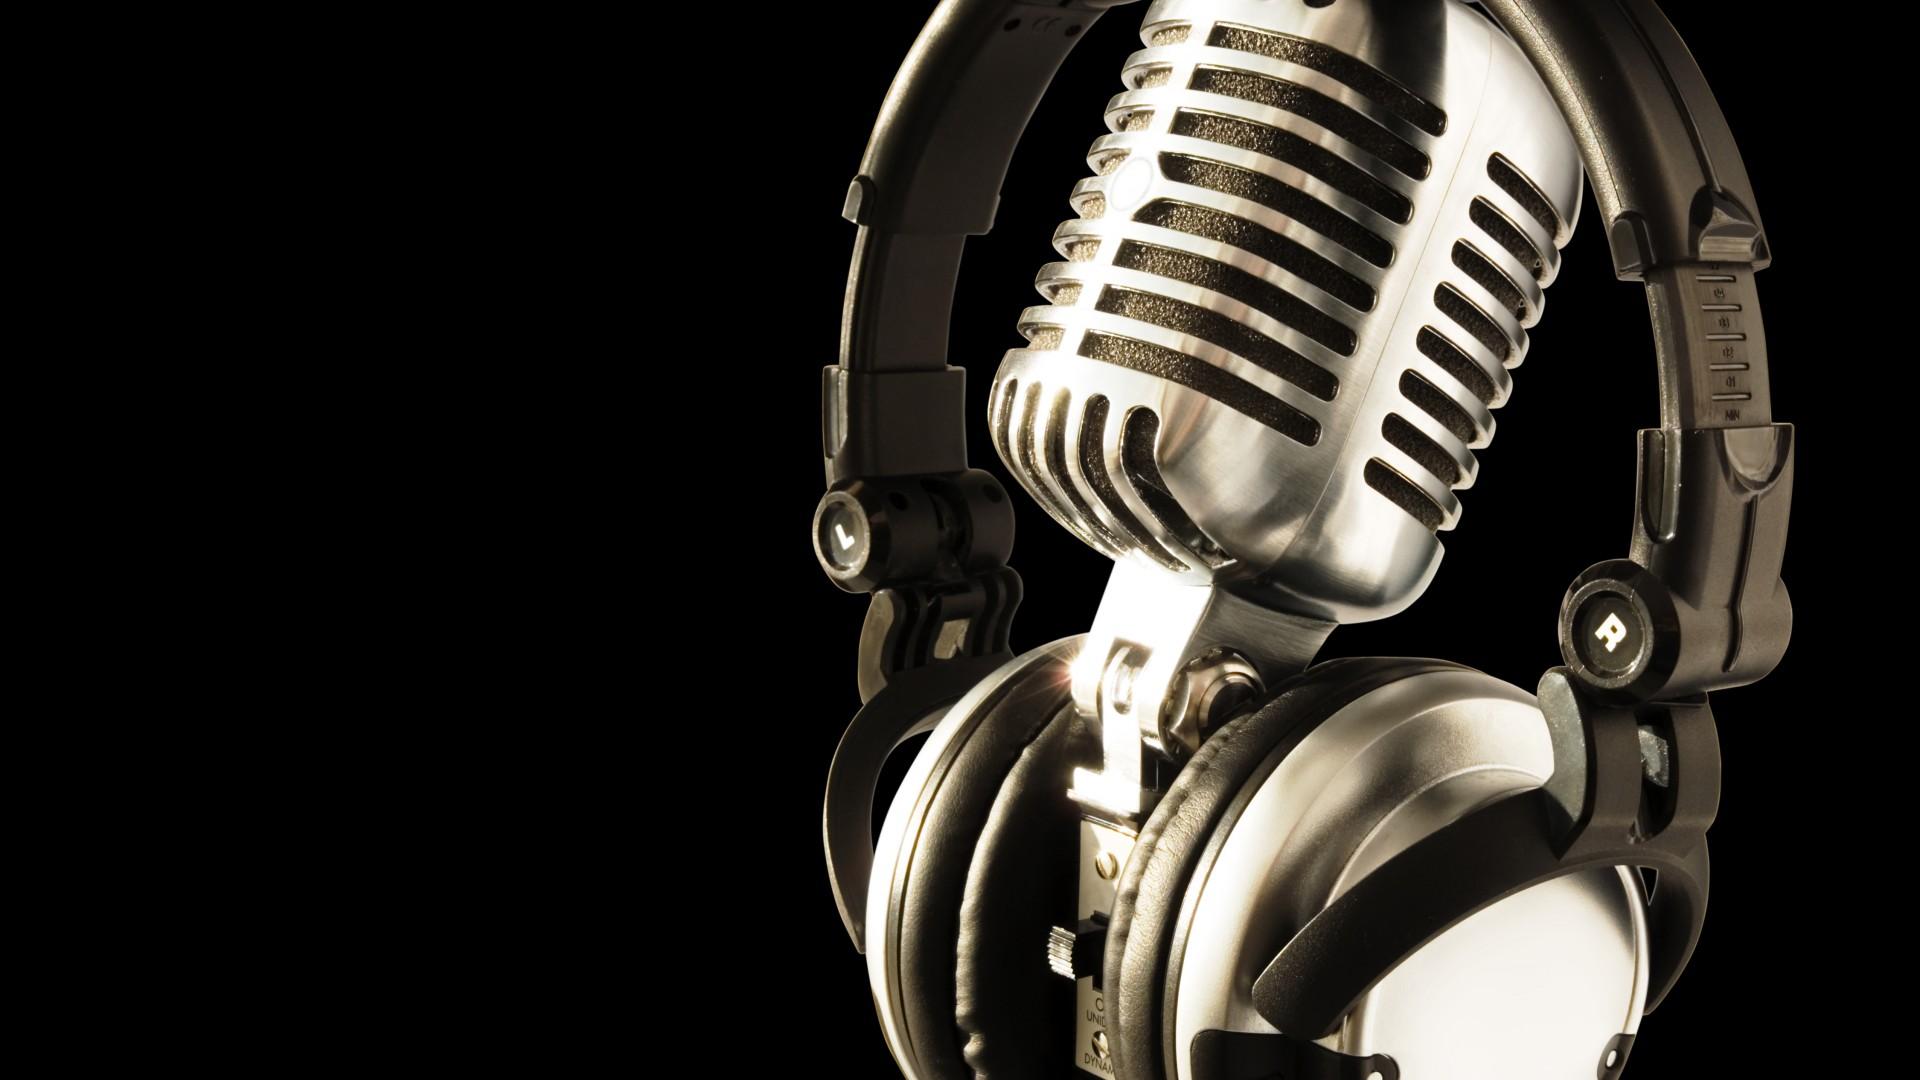 10 fantastic hd microphone wallpapers - Microphone wallpaper ...